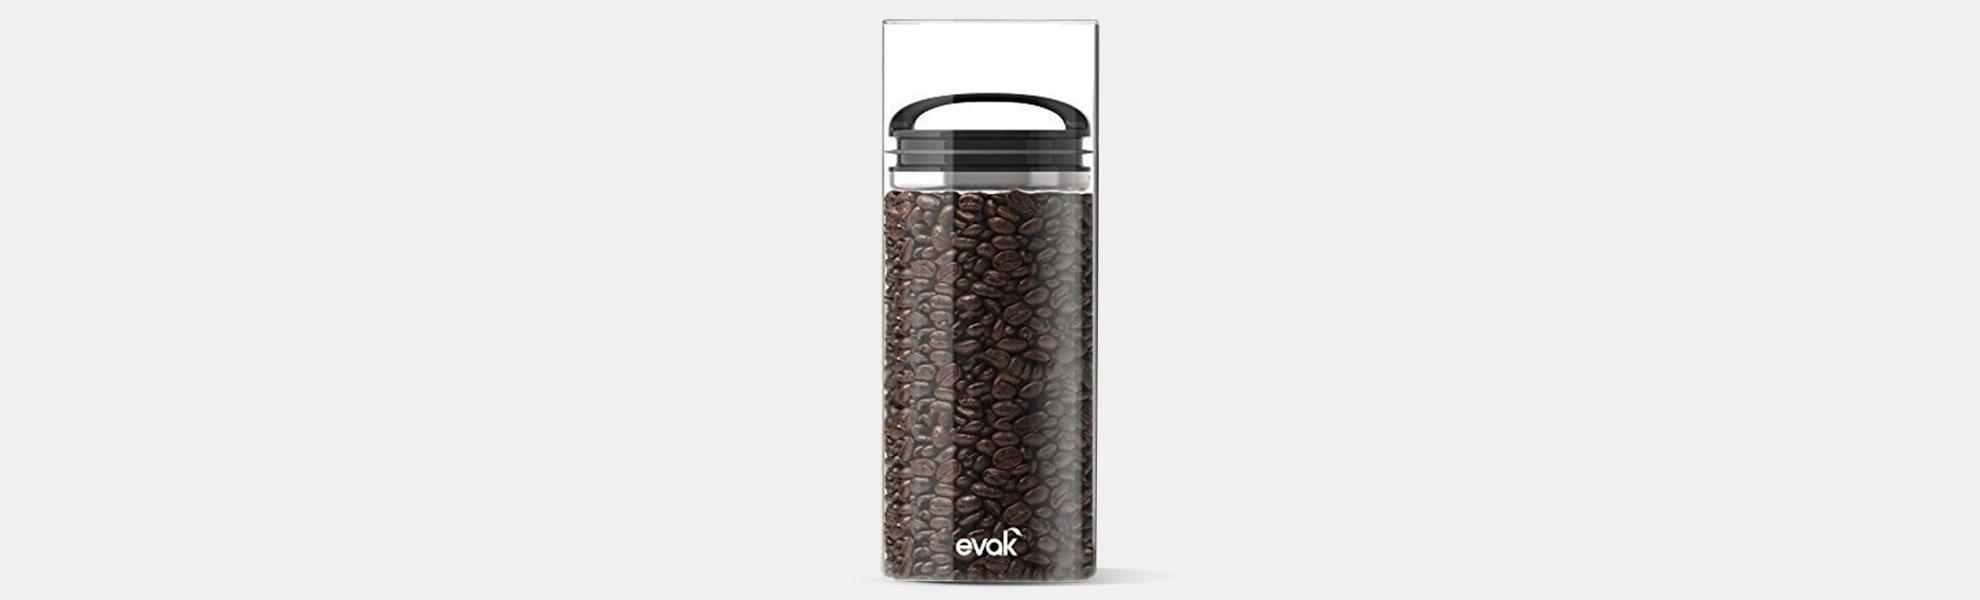 Prepara EVAK Fresh-Saver Storage Containers